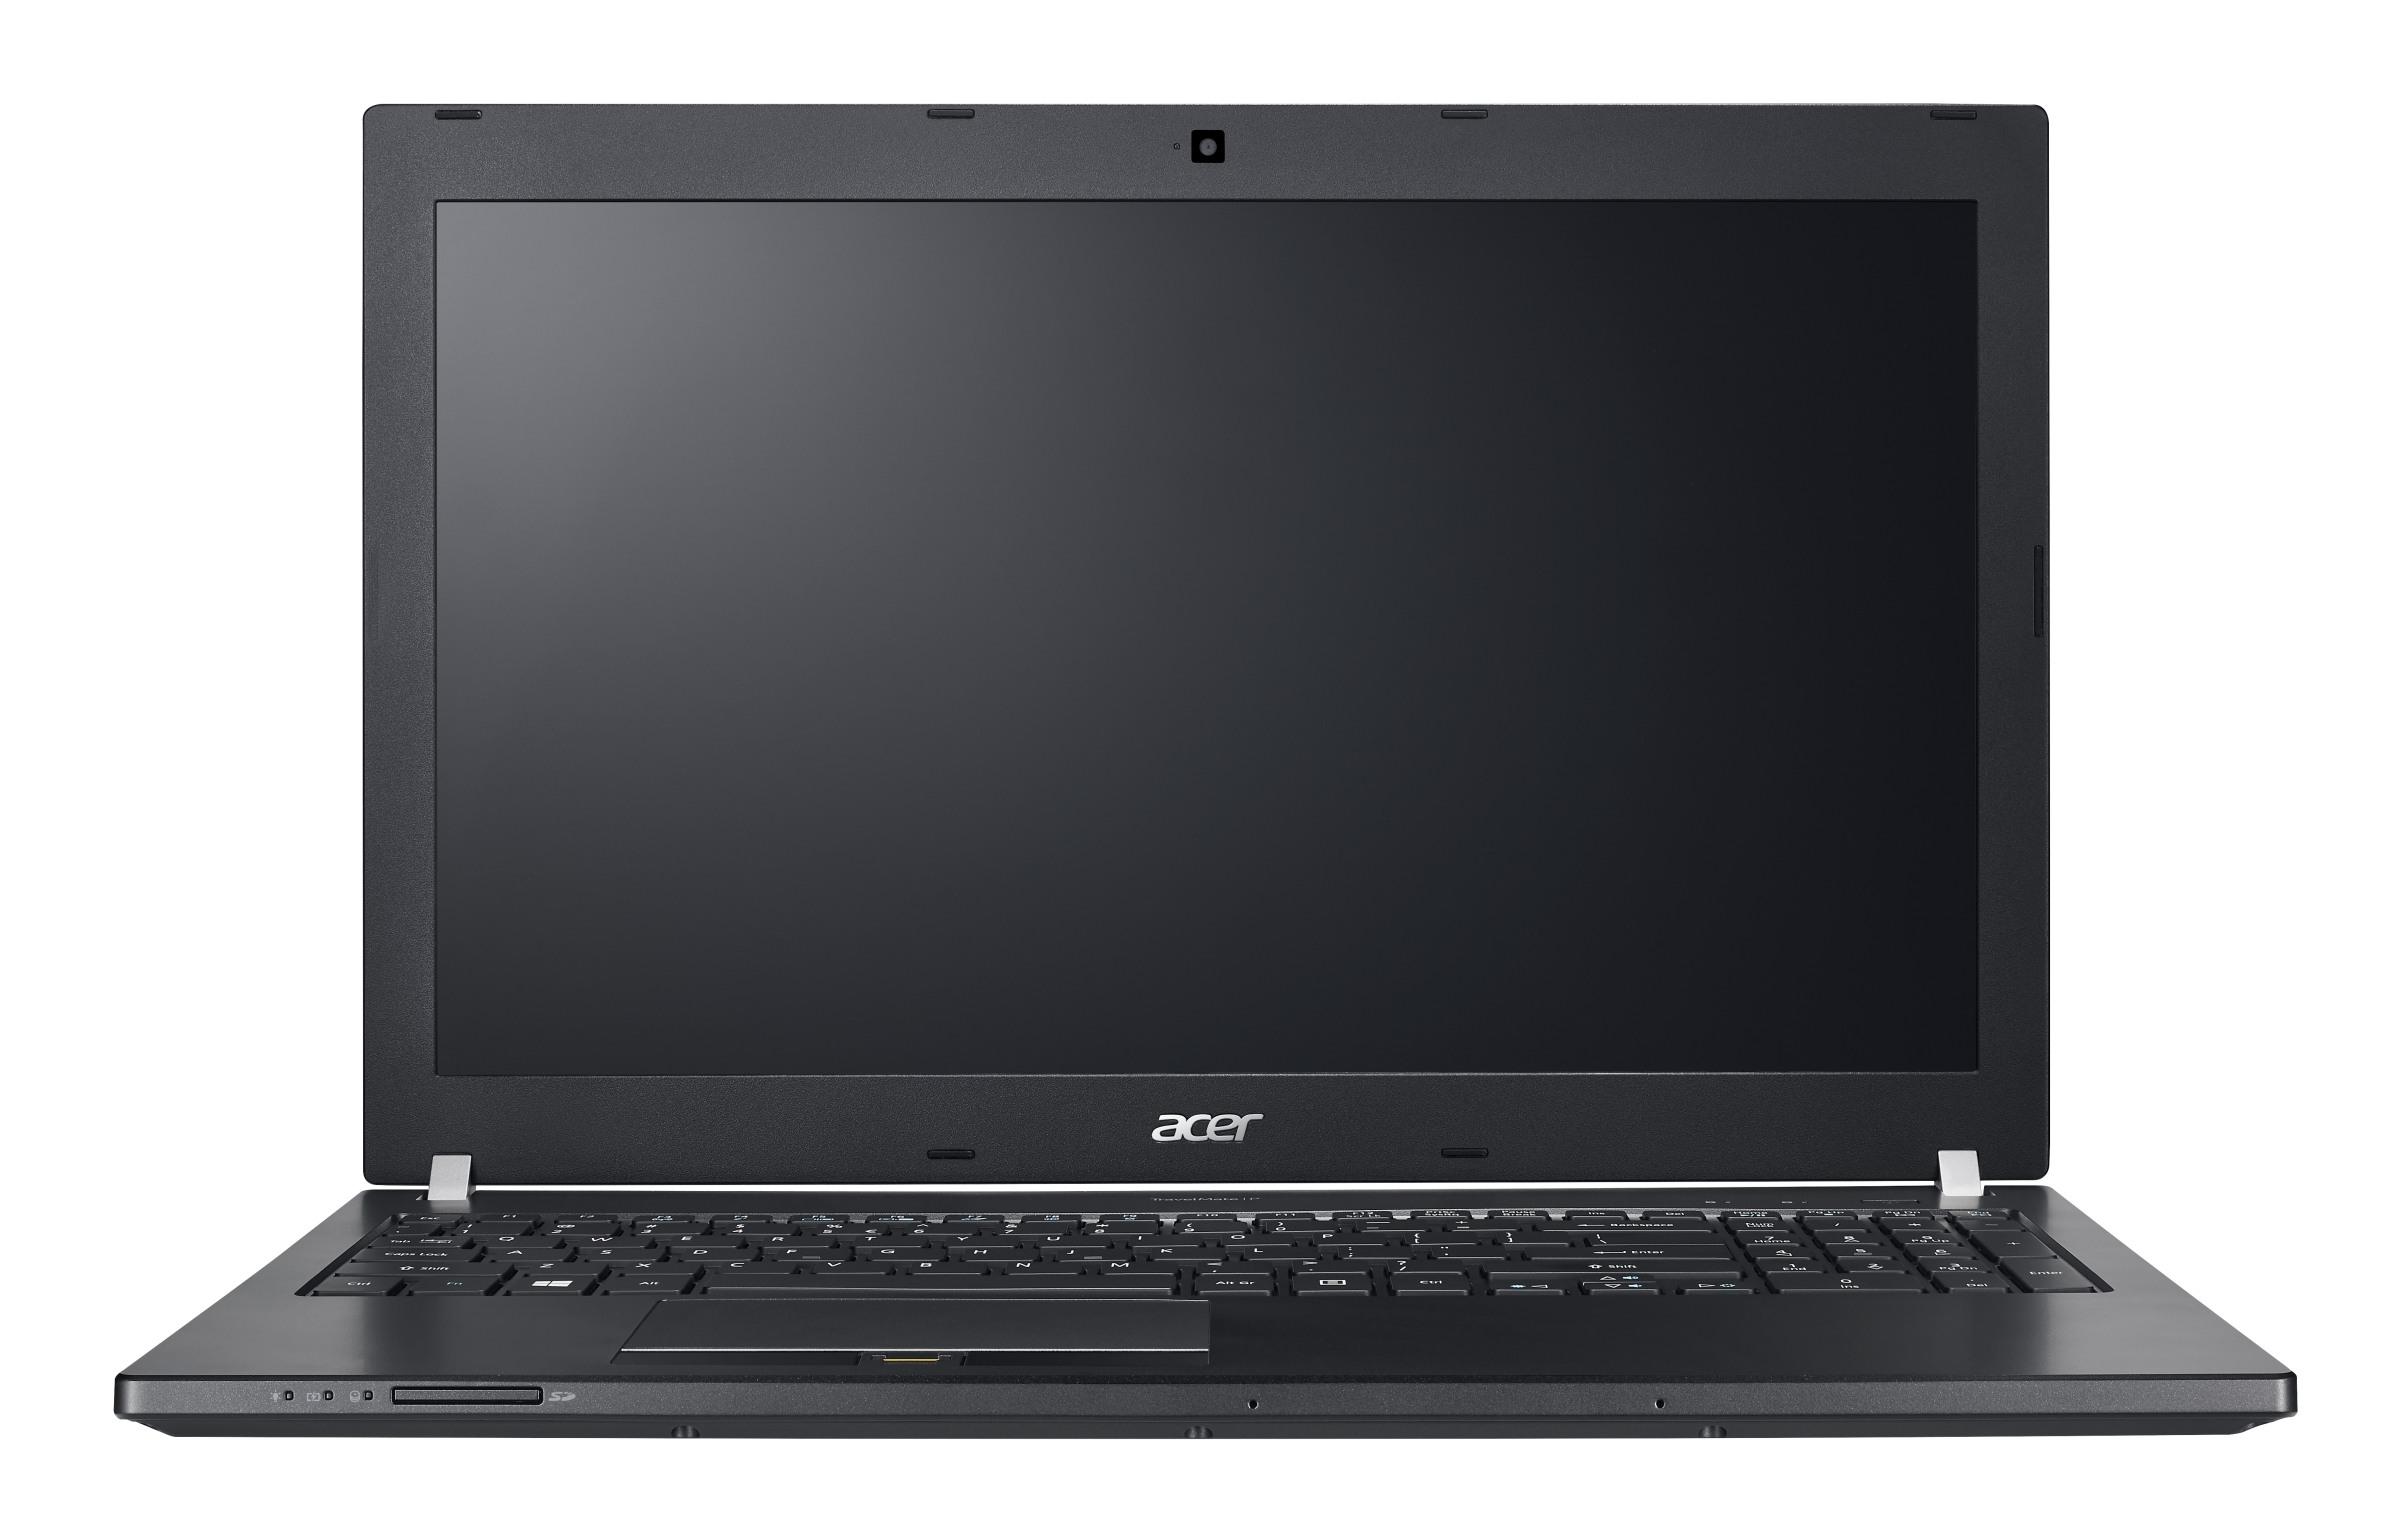 "Acer Travel Mate P658 15.6"" FHD IPS|i7-6500U|12GB DDR4|256+256GB SSD|NV940M|LTE|Windows 10 Pro"